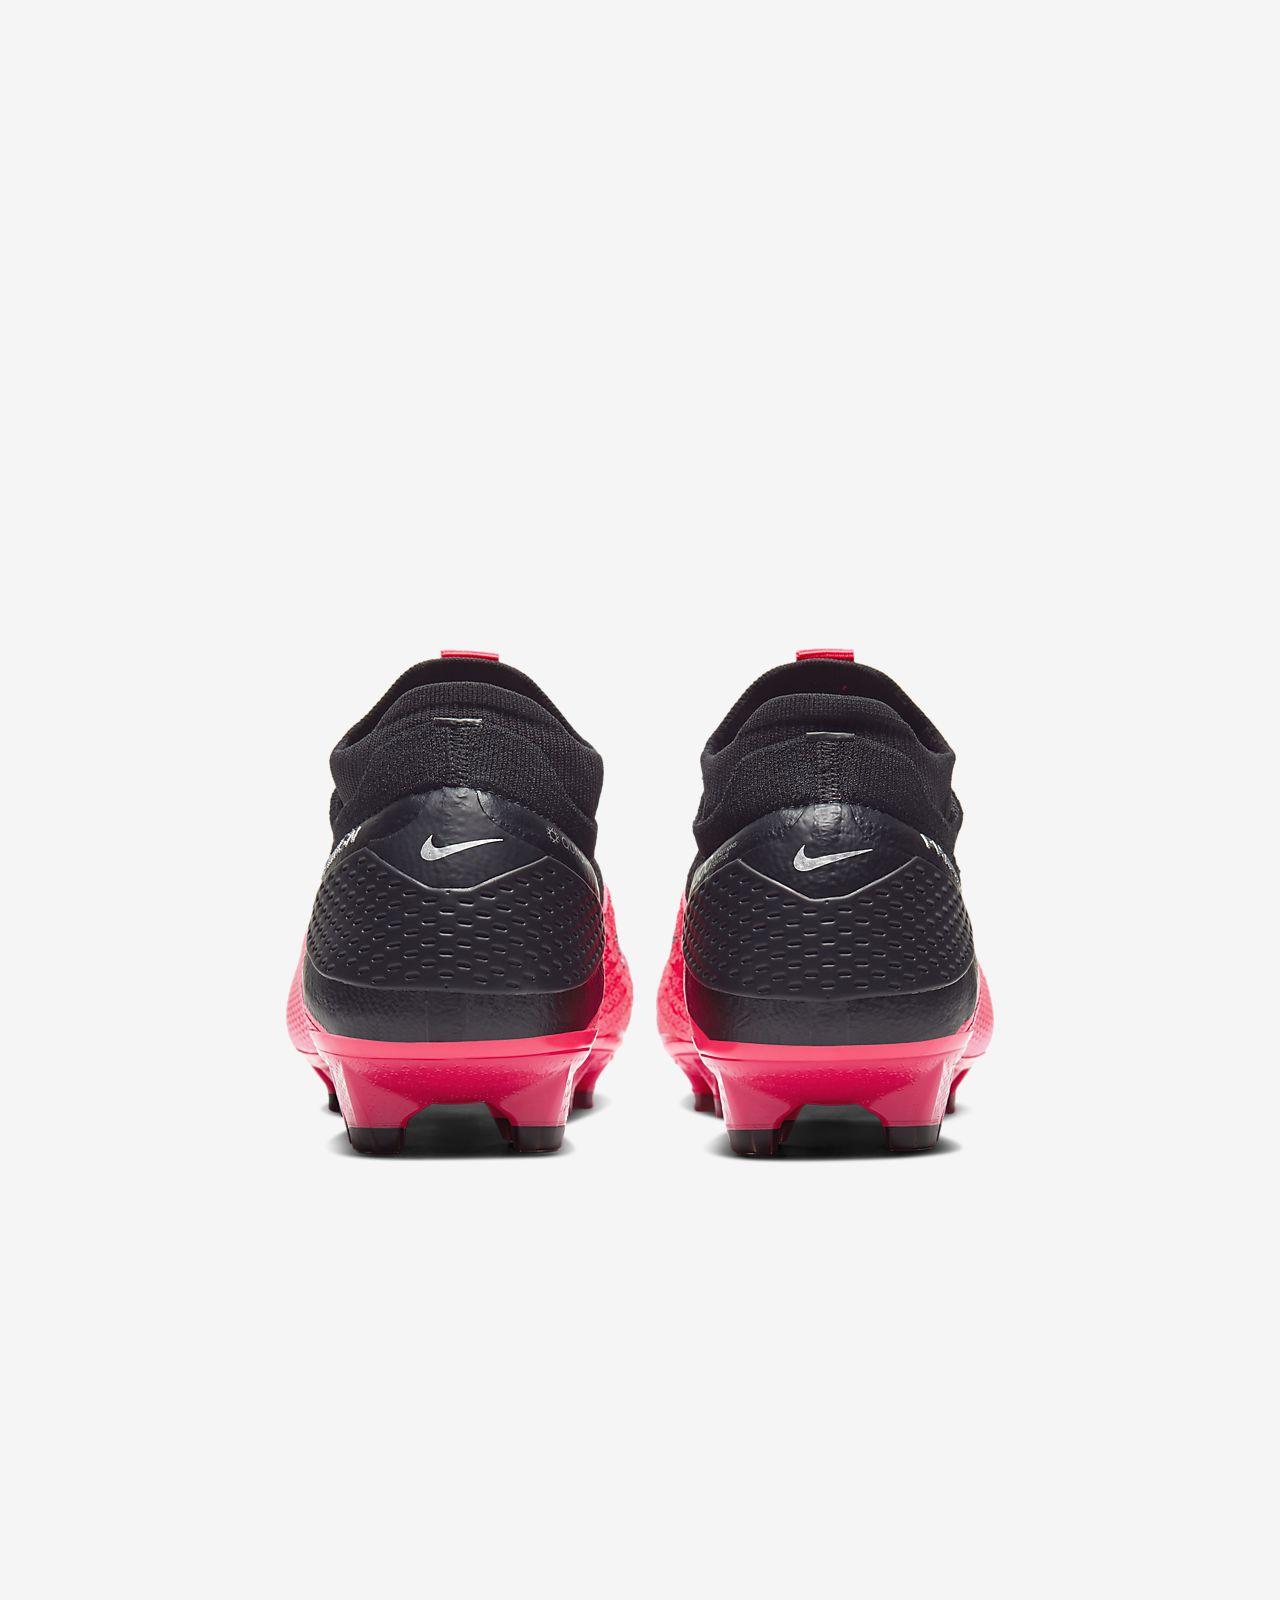 Nike Total90 Laser Elite FG Soccer Cleats (BlackNeon Green)